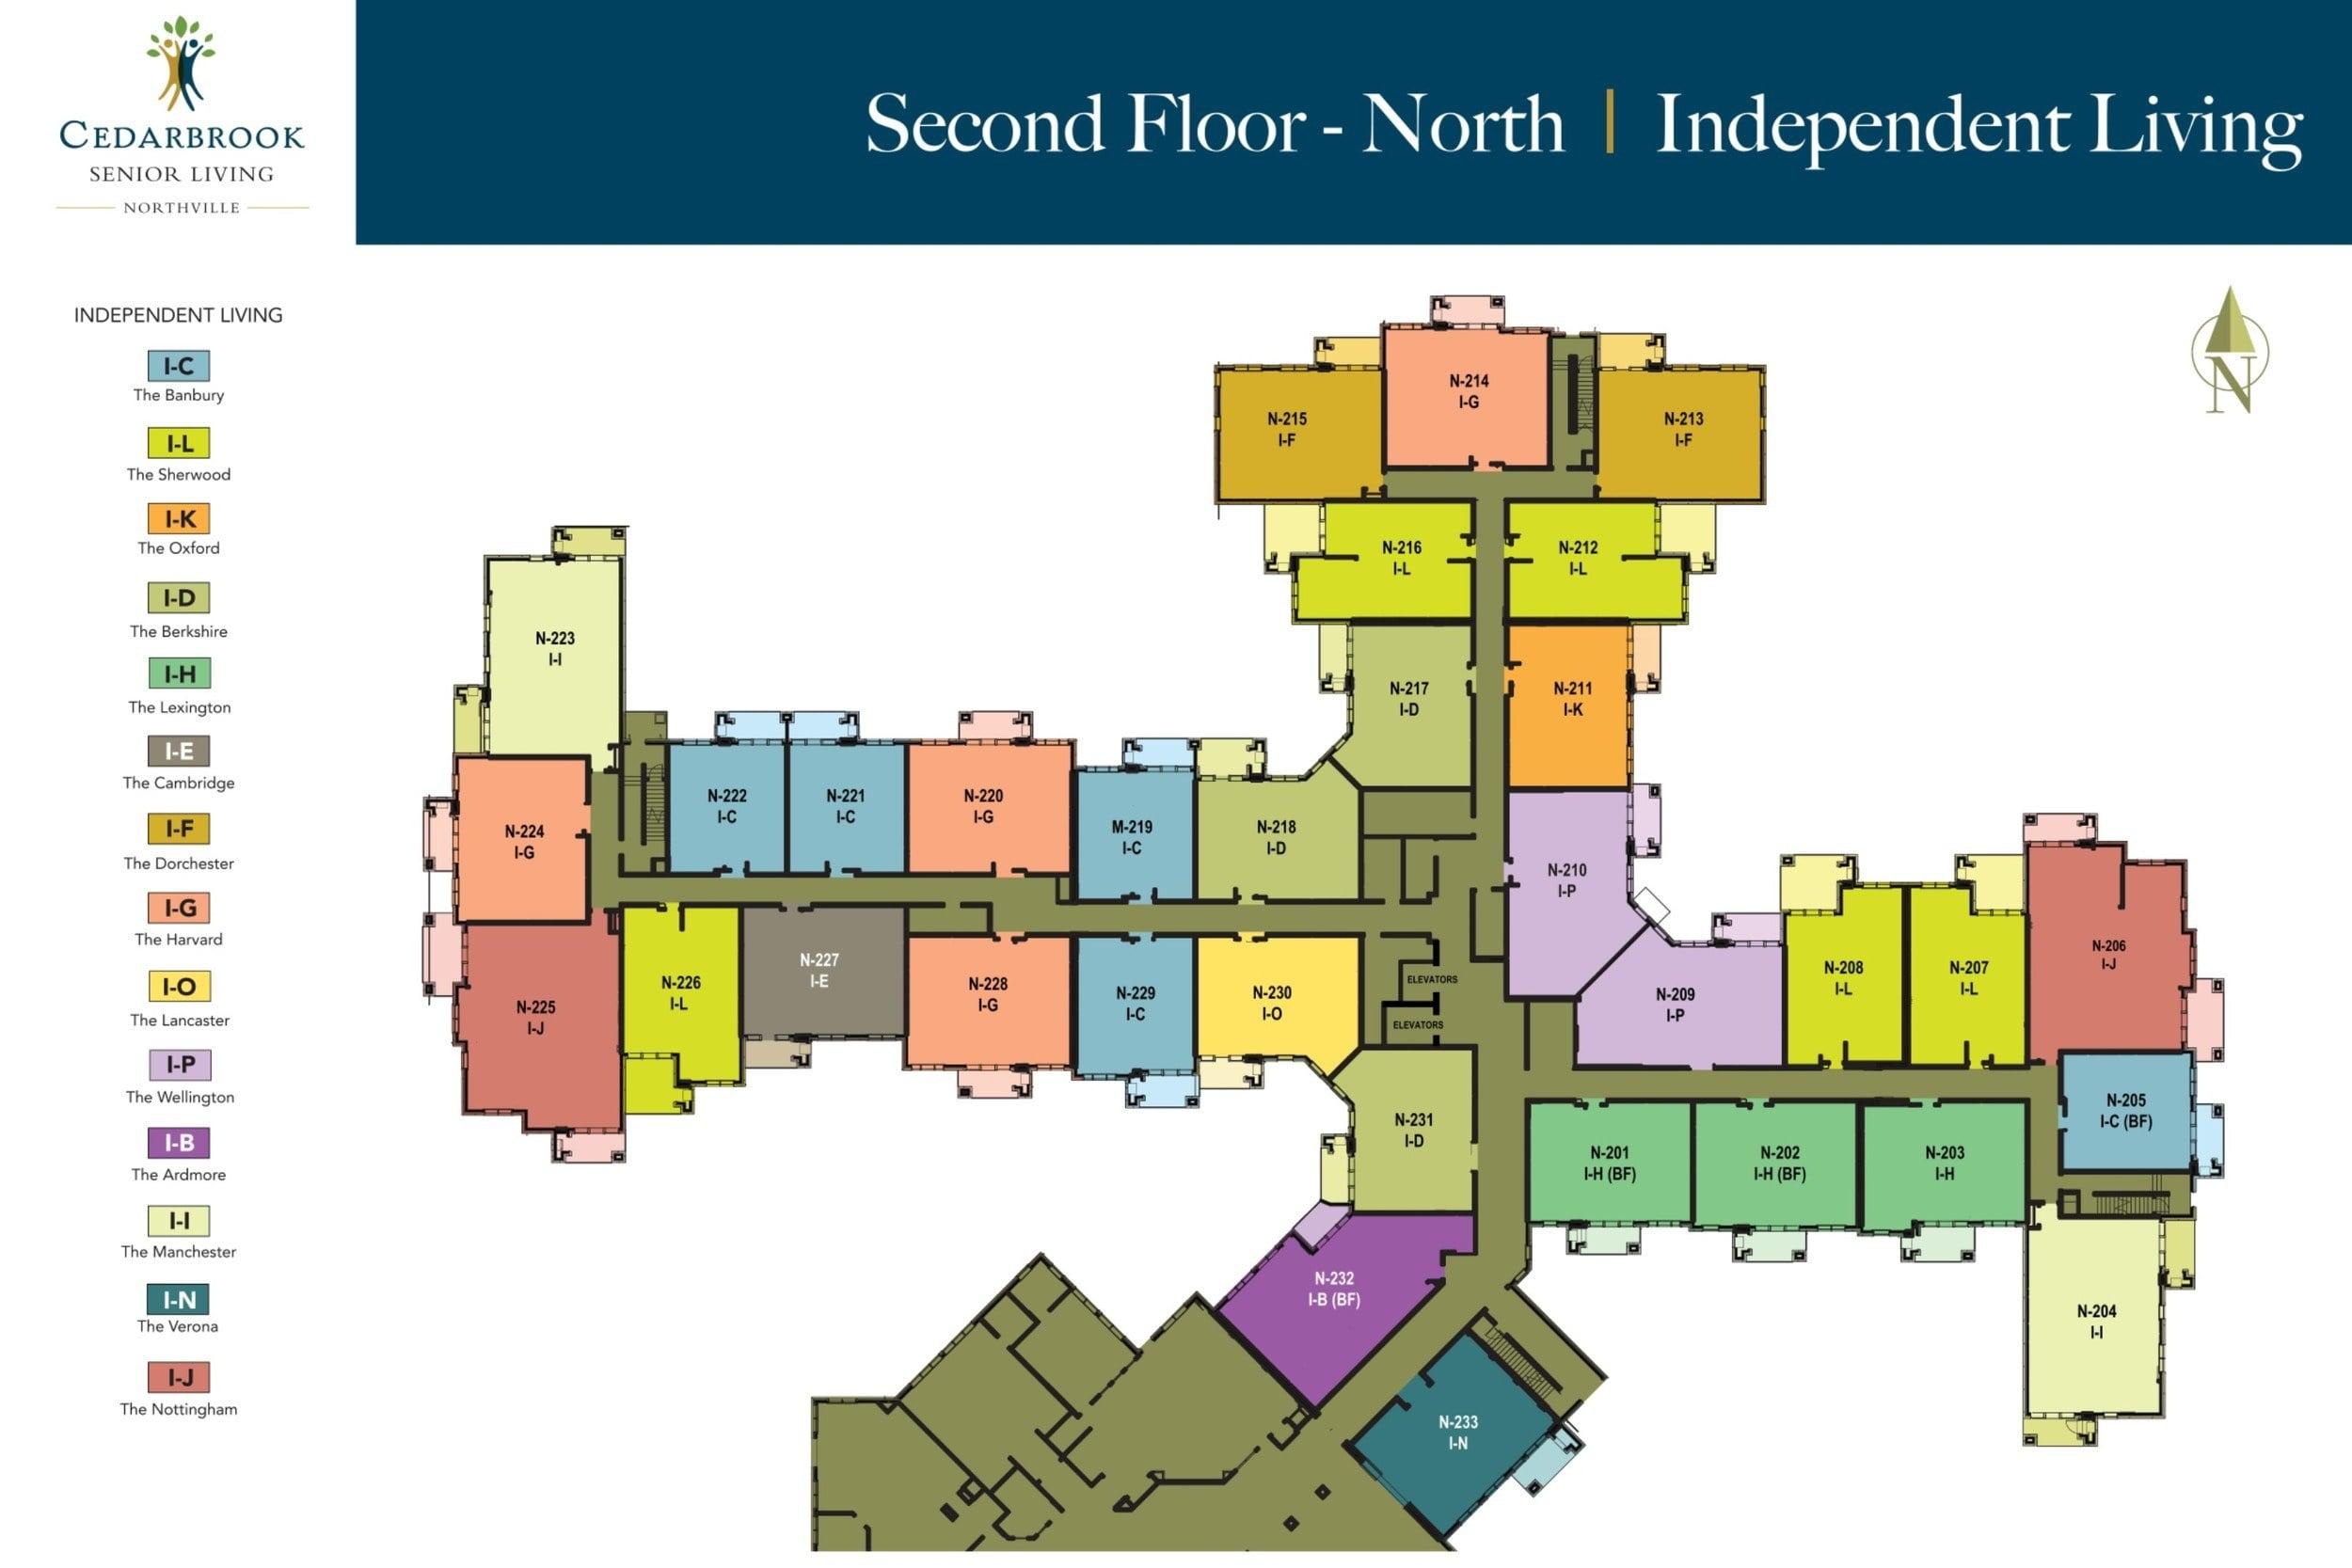 Second Floor North - Independent Living